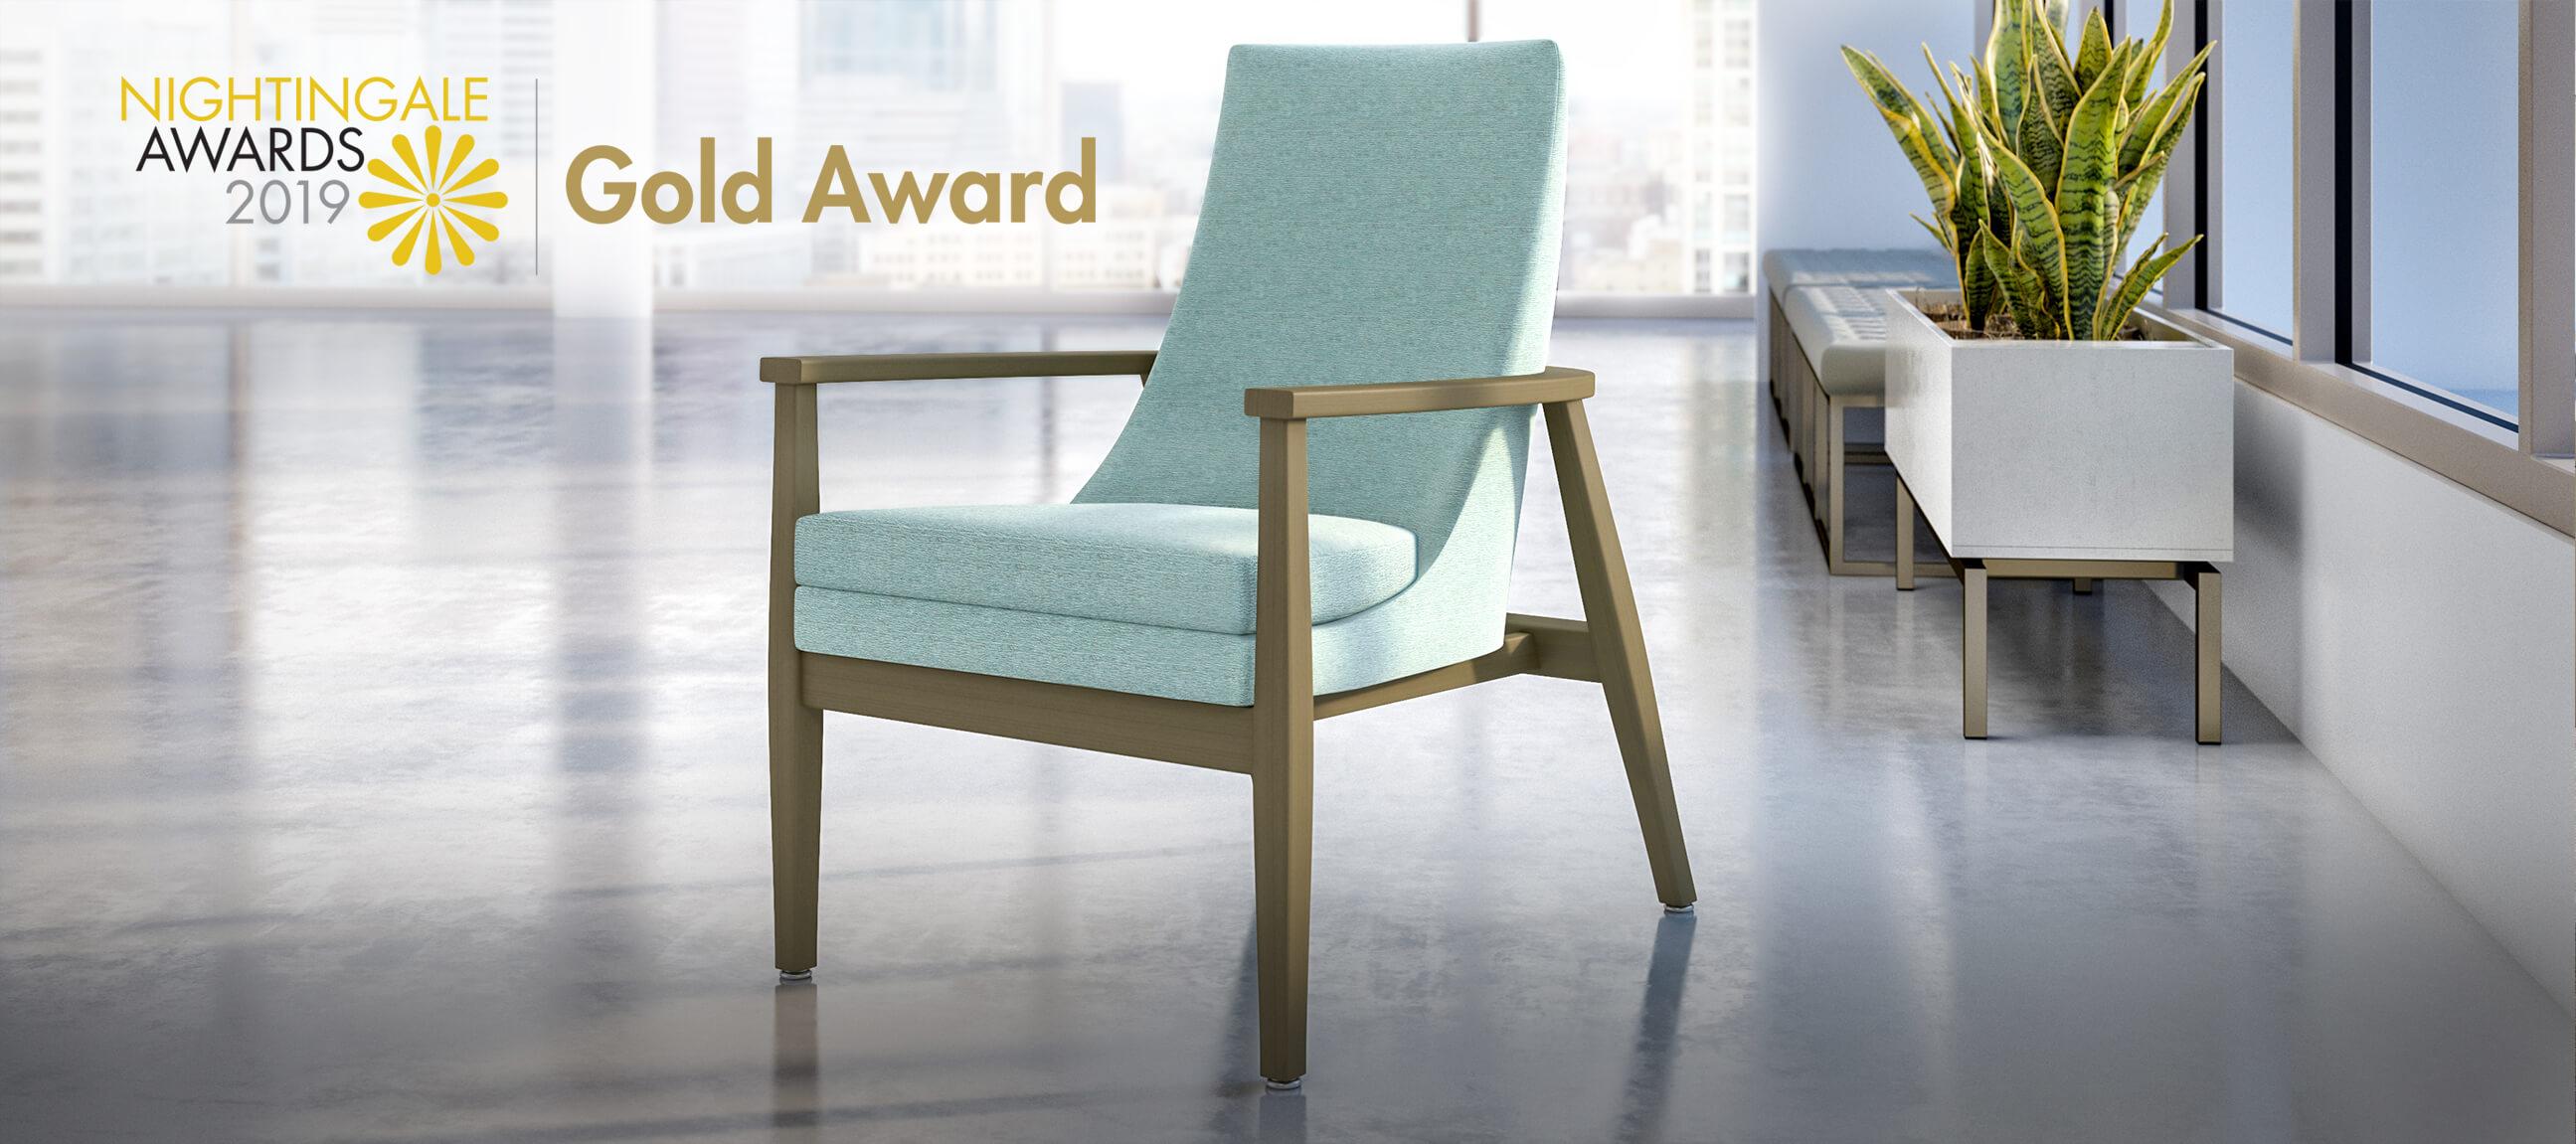 Nightingale Gold Award